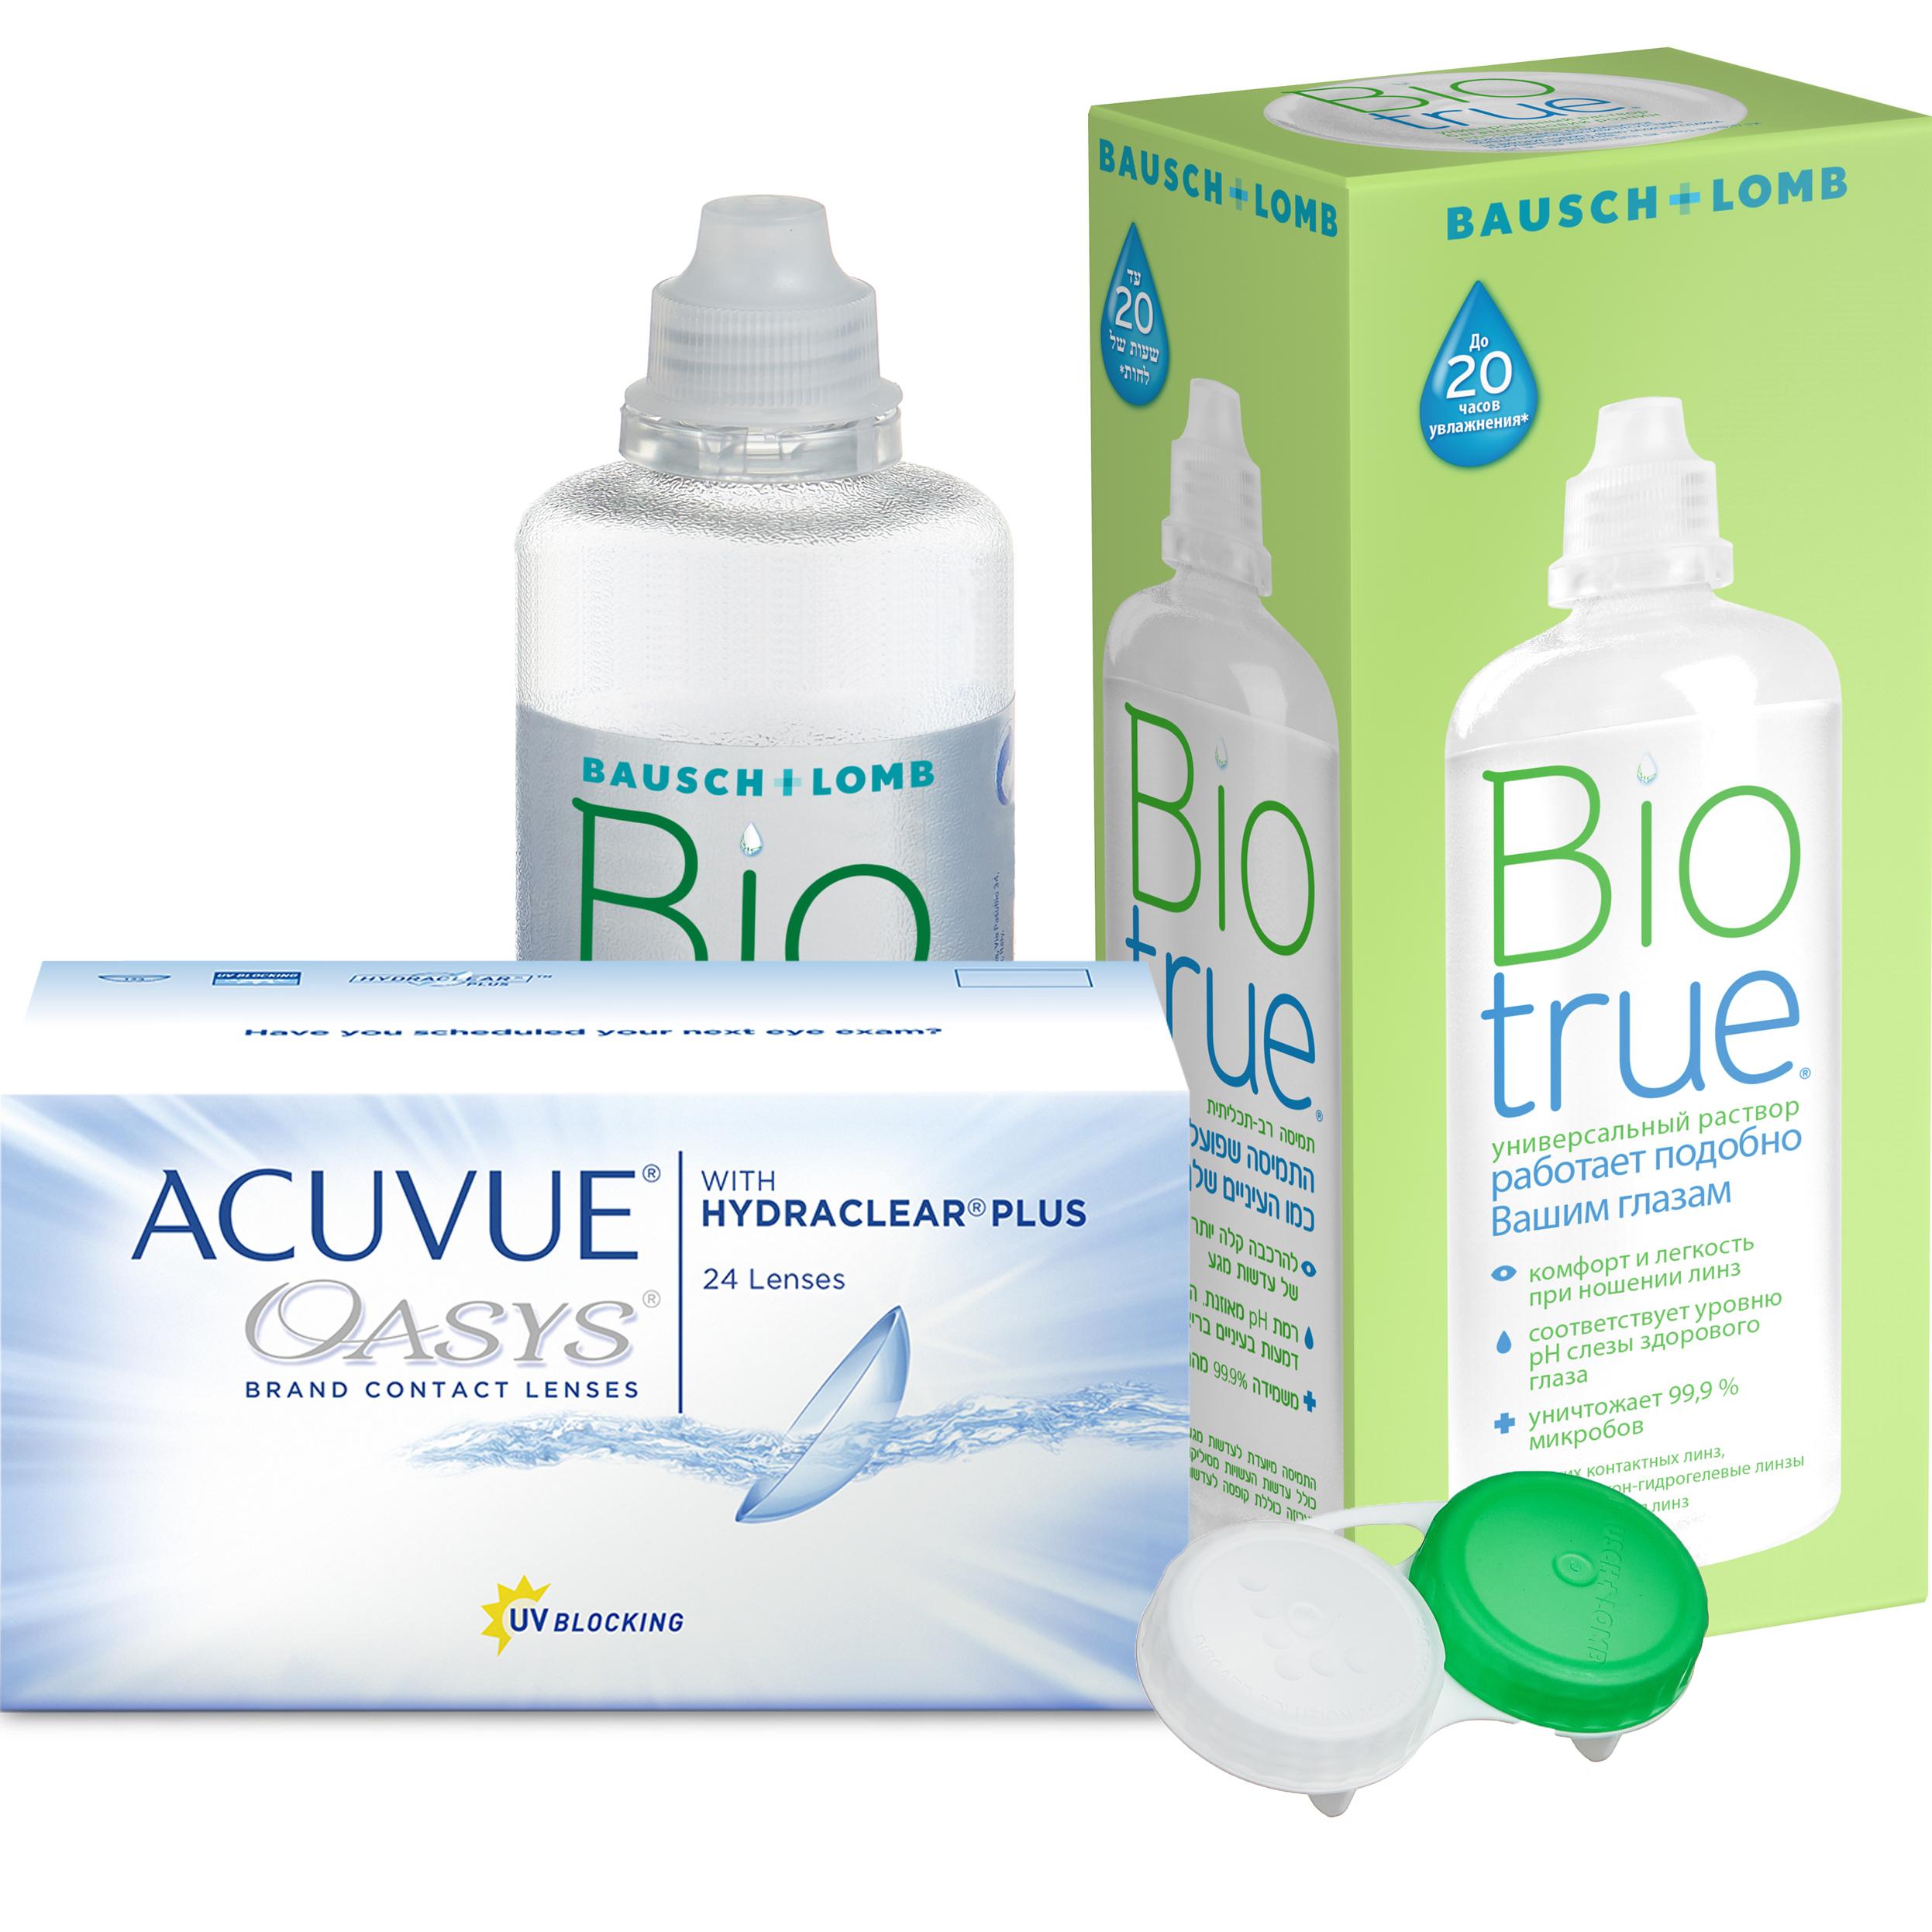 Купить Oasys with Hydraclear Plus 24 линзы + Biotrue, Контактные линзы Acuvue Oasys with Hydraclear Plus 24 линзы R 8.4 -6, 50 + Biotrue 300 мл